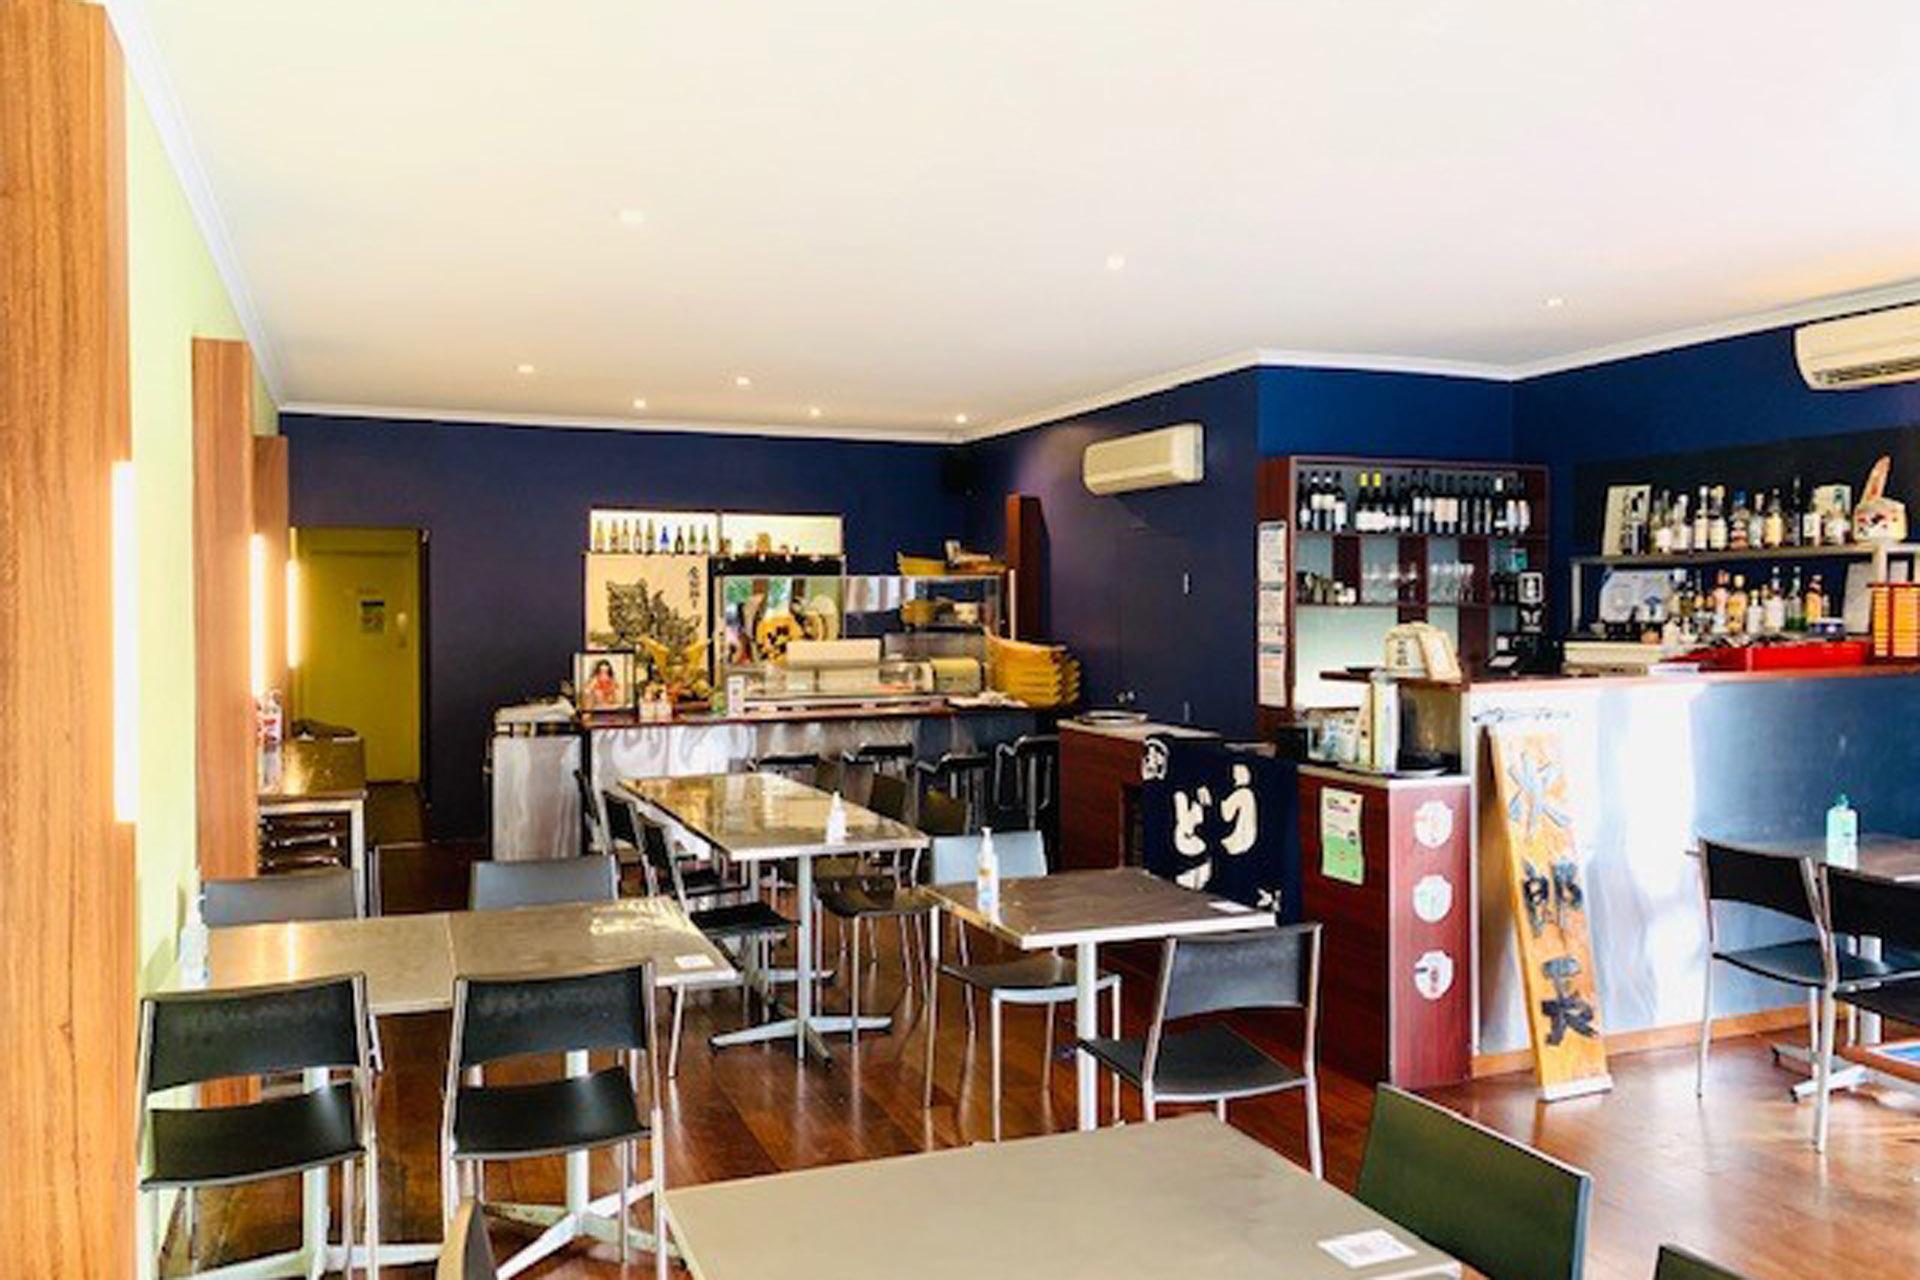 e - Jirochyo Japanese Bar & Restaurant